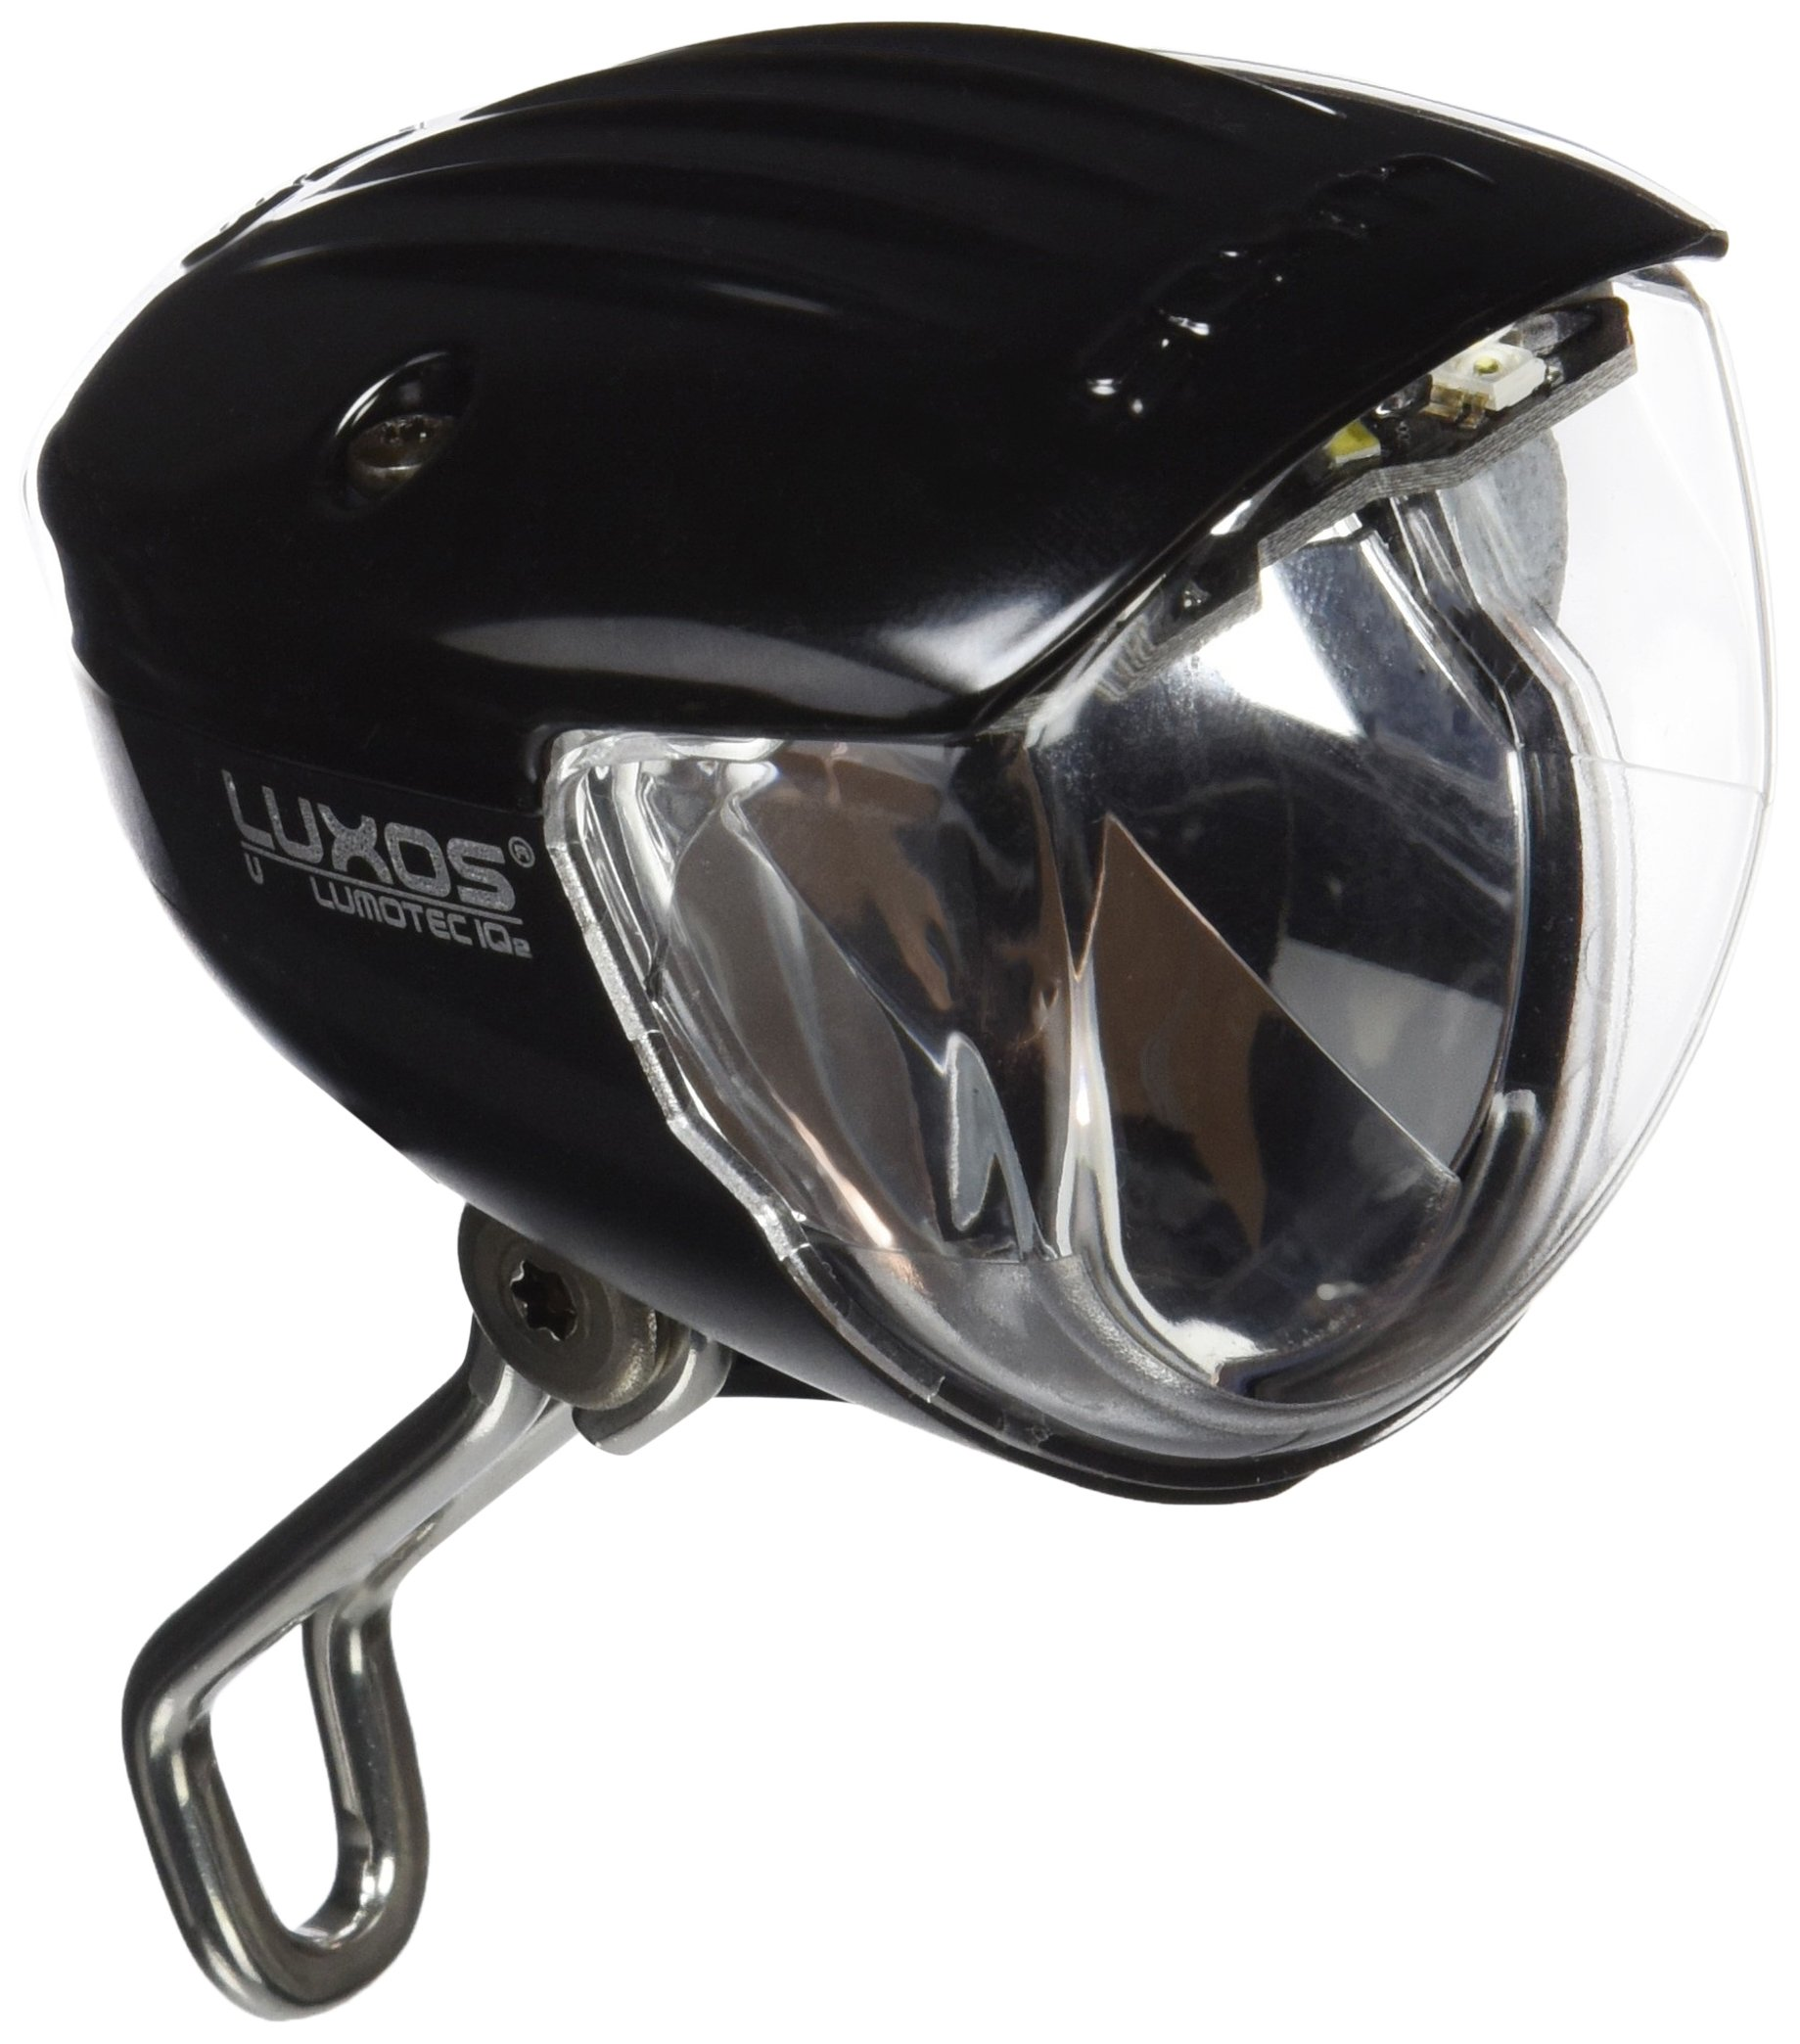 Busch u. Müller Lumotec IQ2 Luxos U dynamo bike lights black